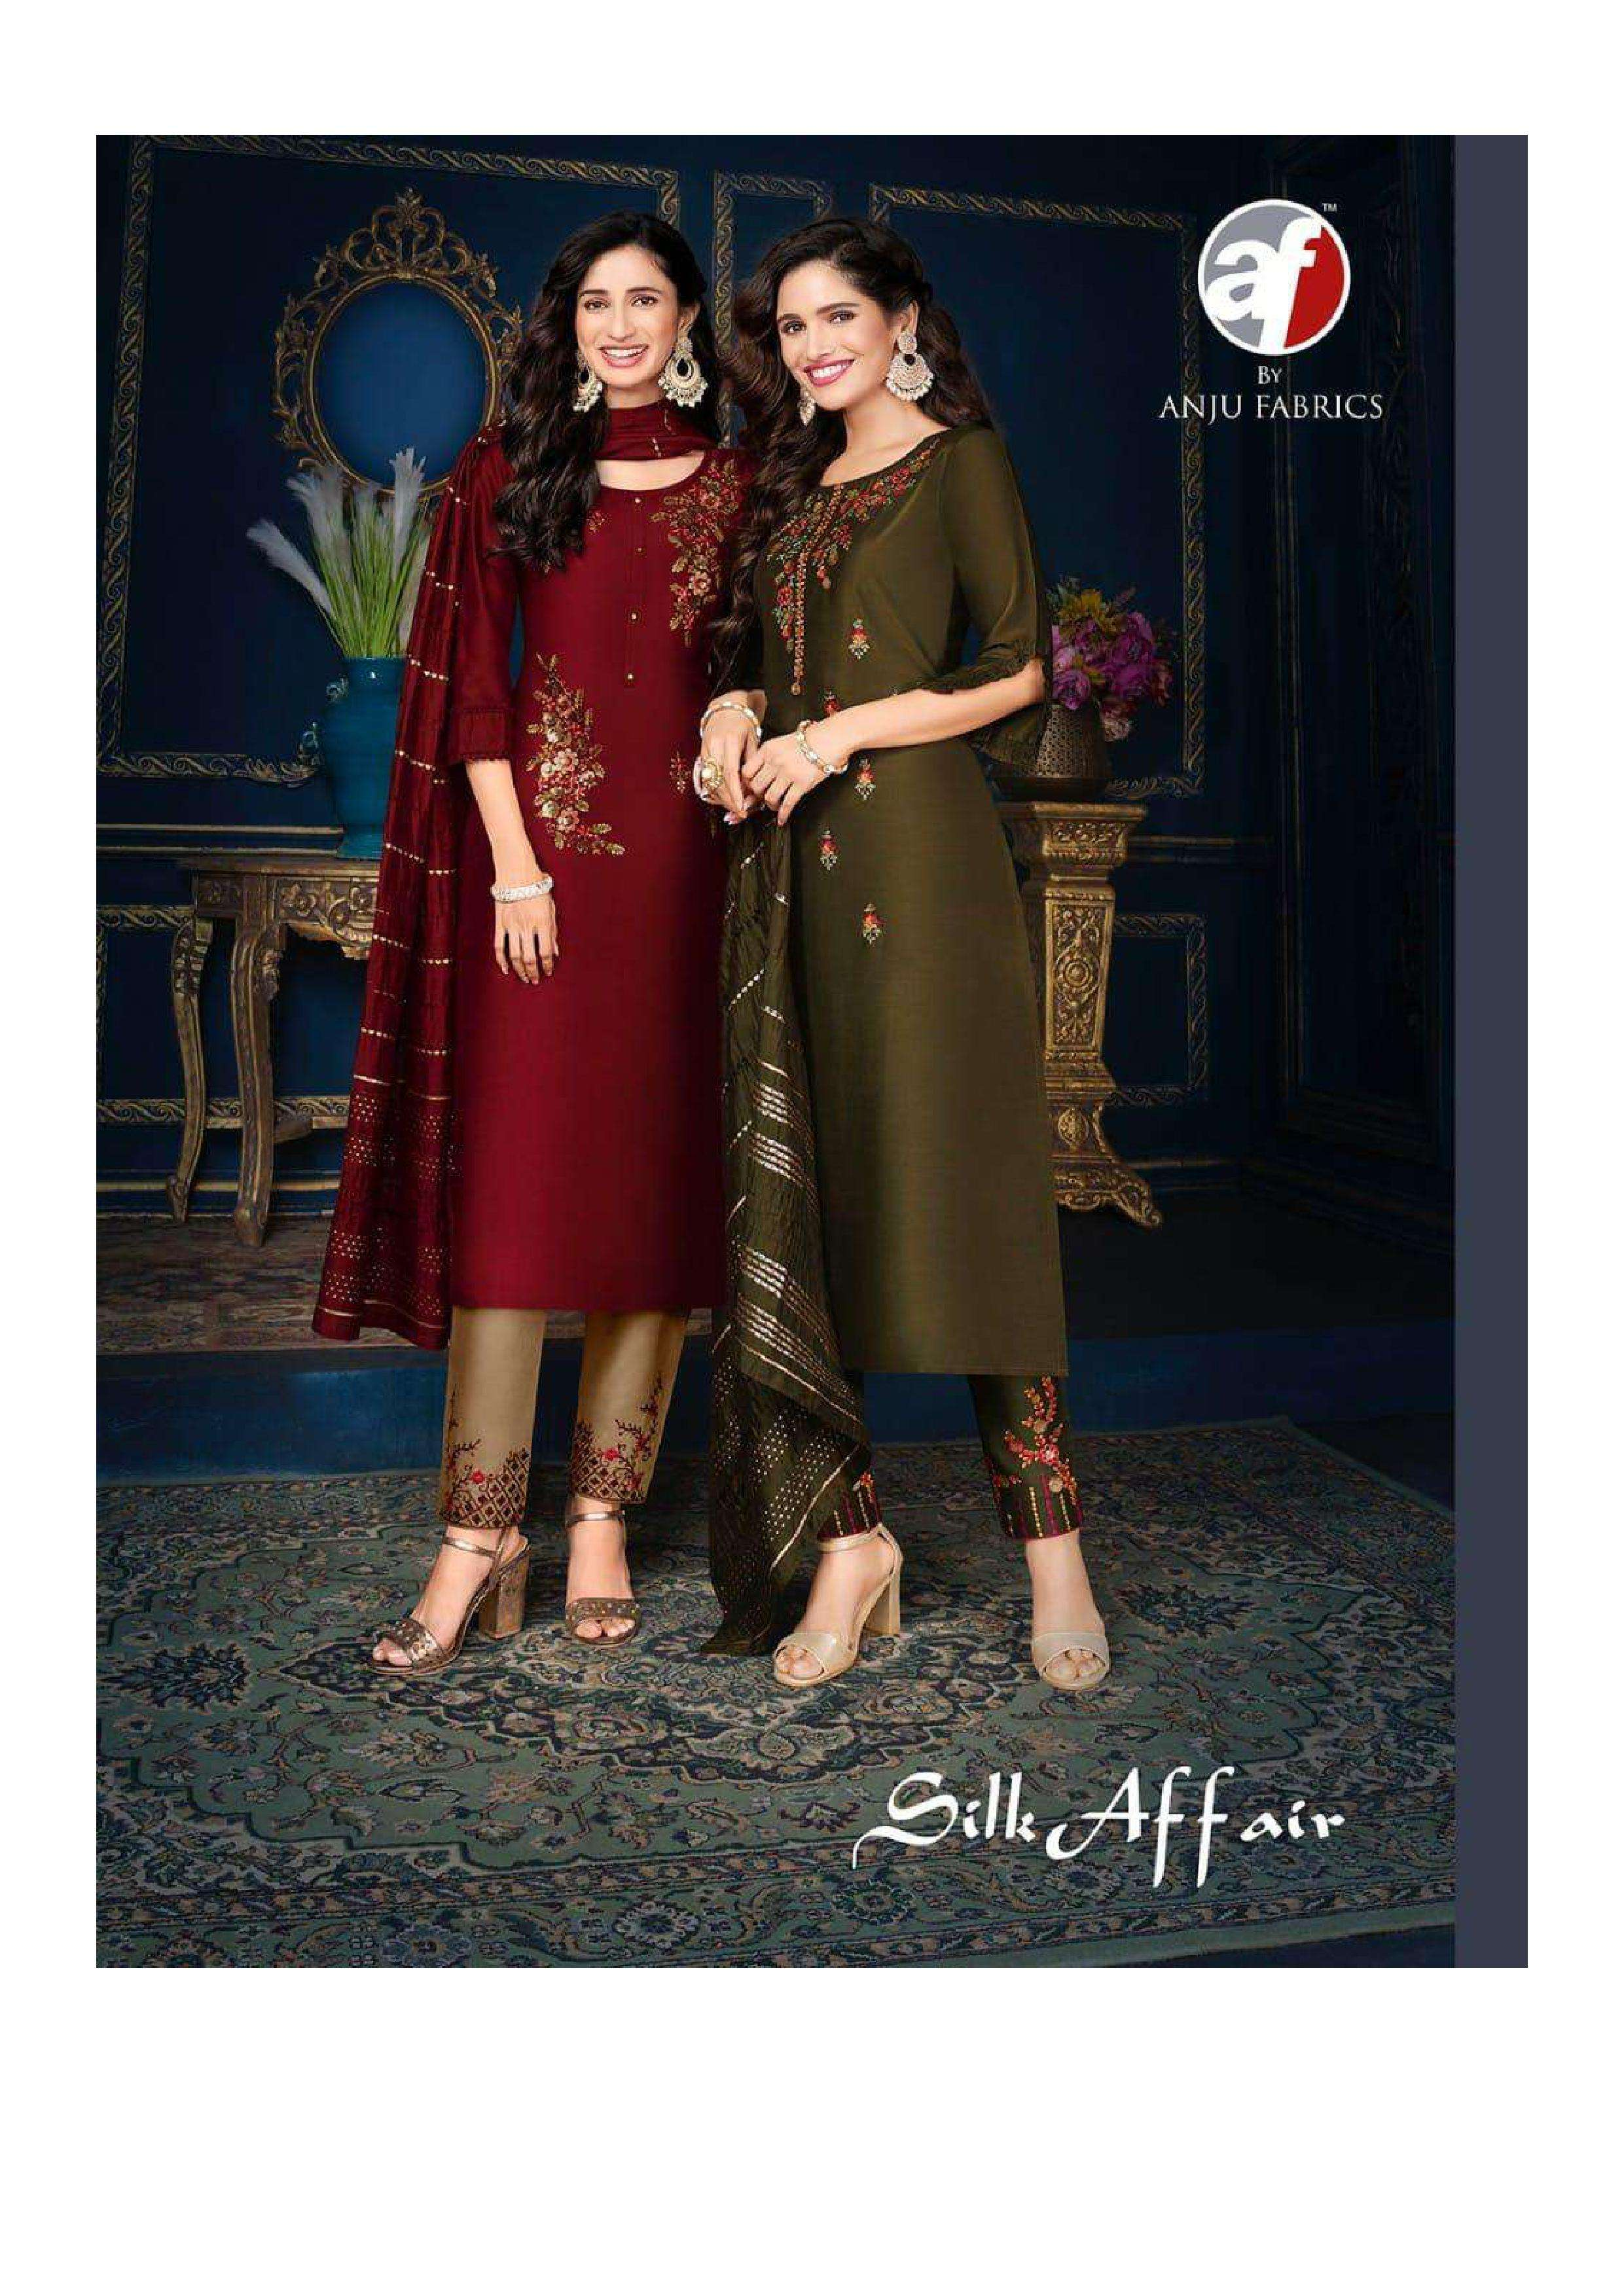 anju fab silk affair 5011-5018 comfort silk suit